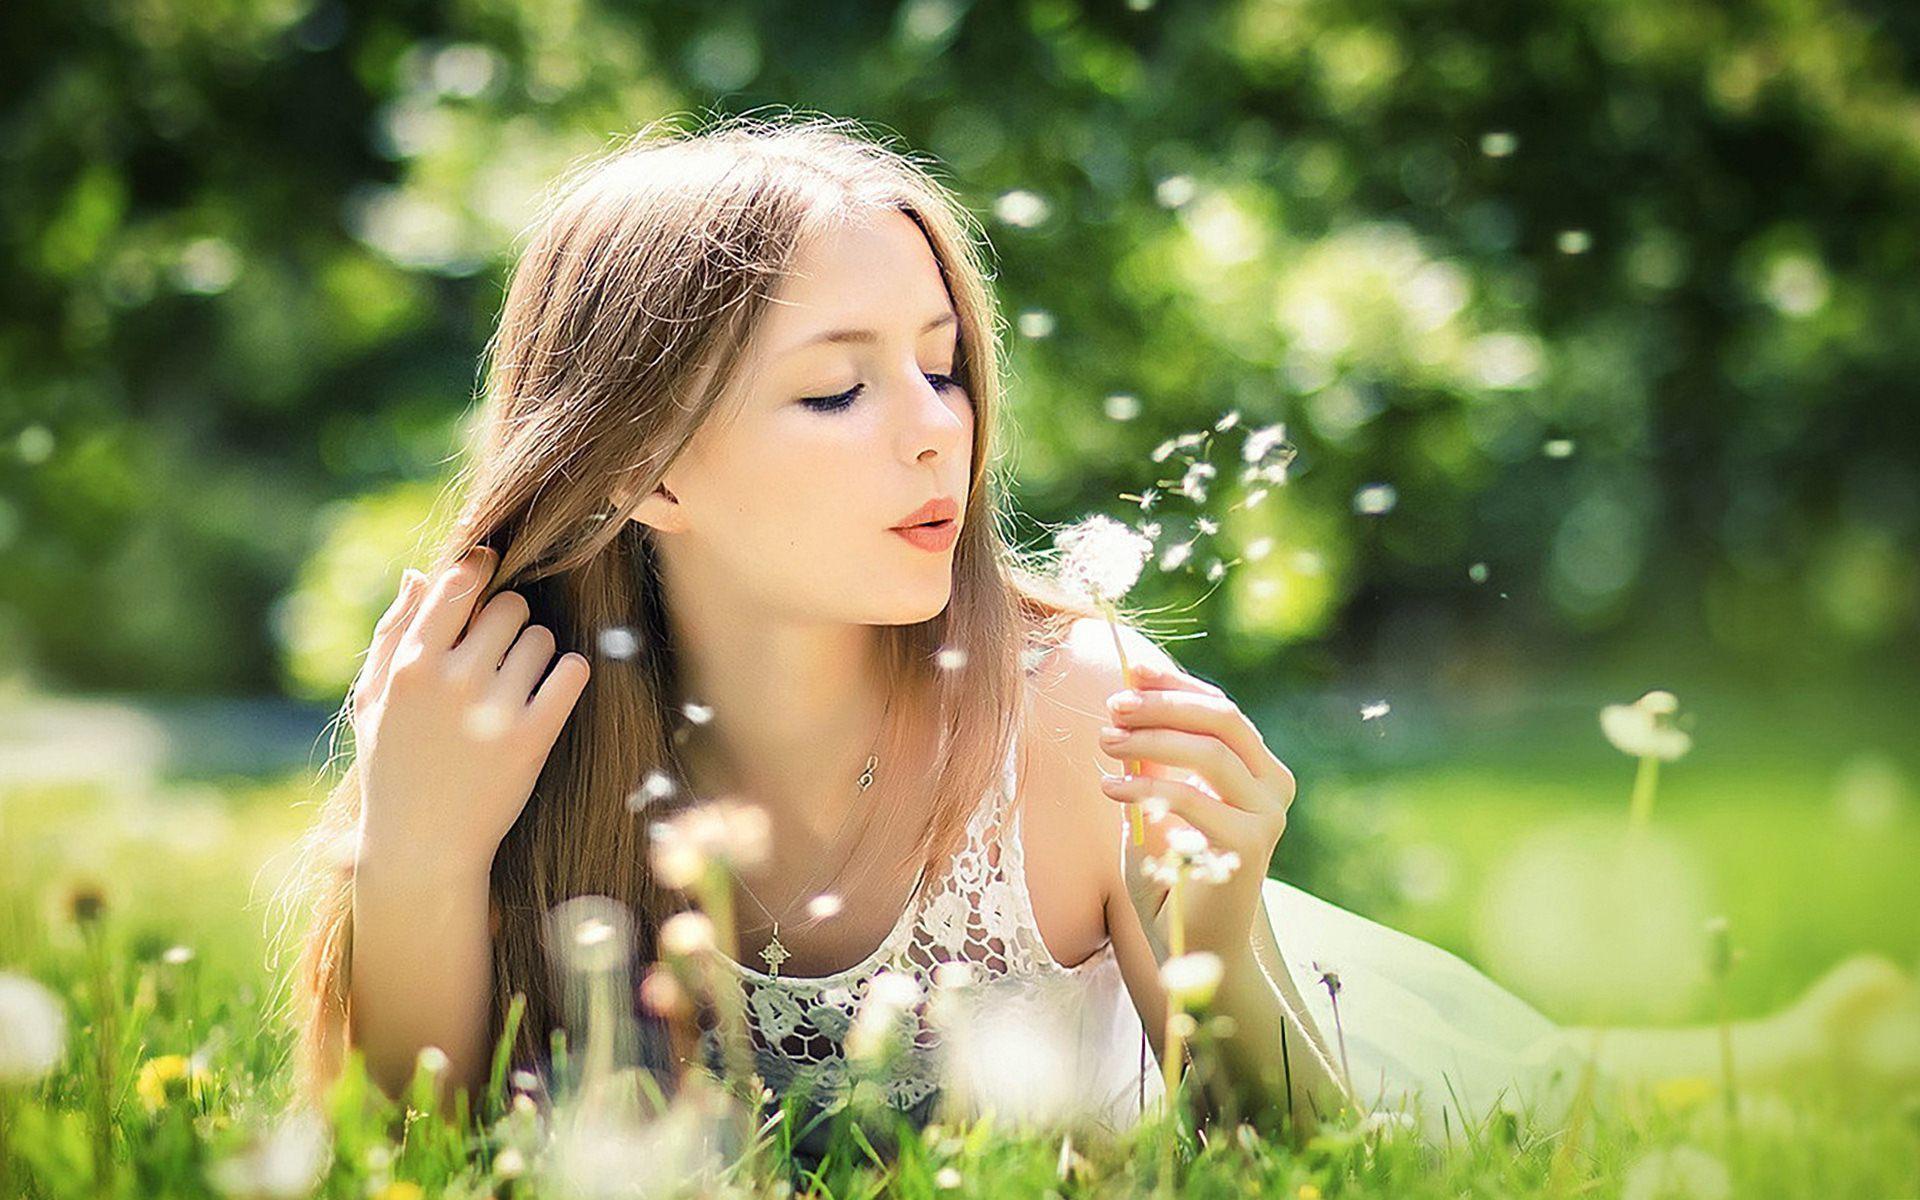 Res: 1920x1200, Girl Blowing Dandelion